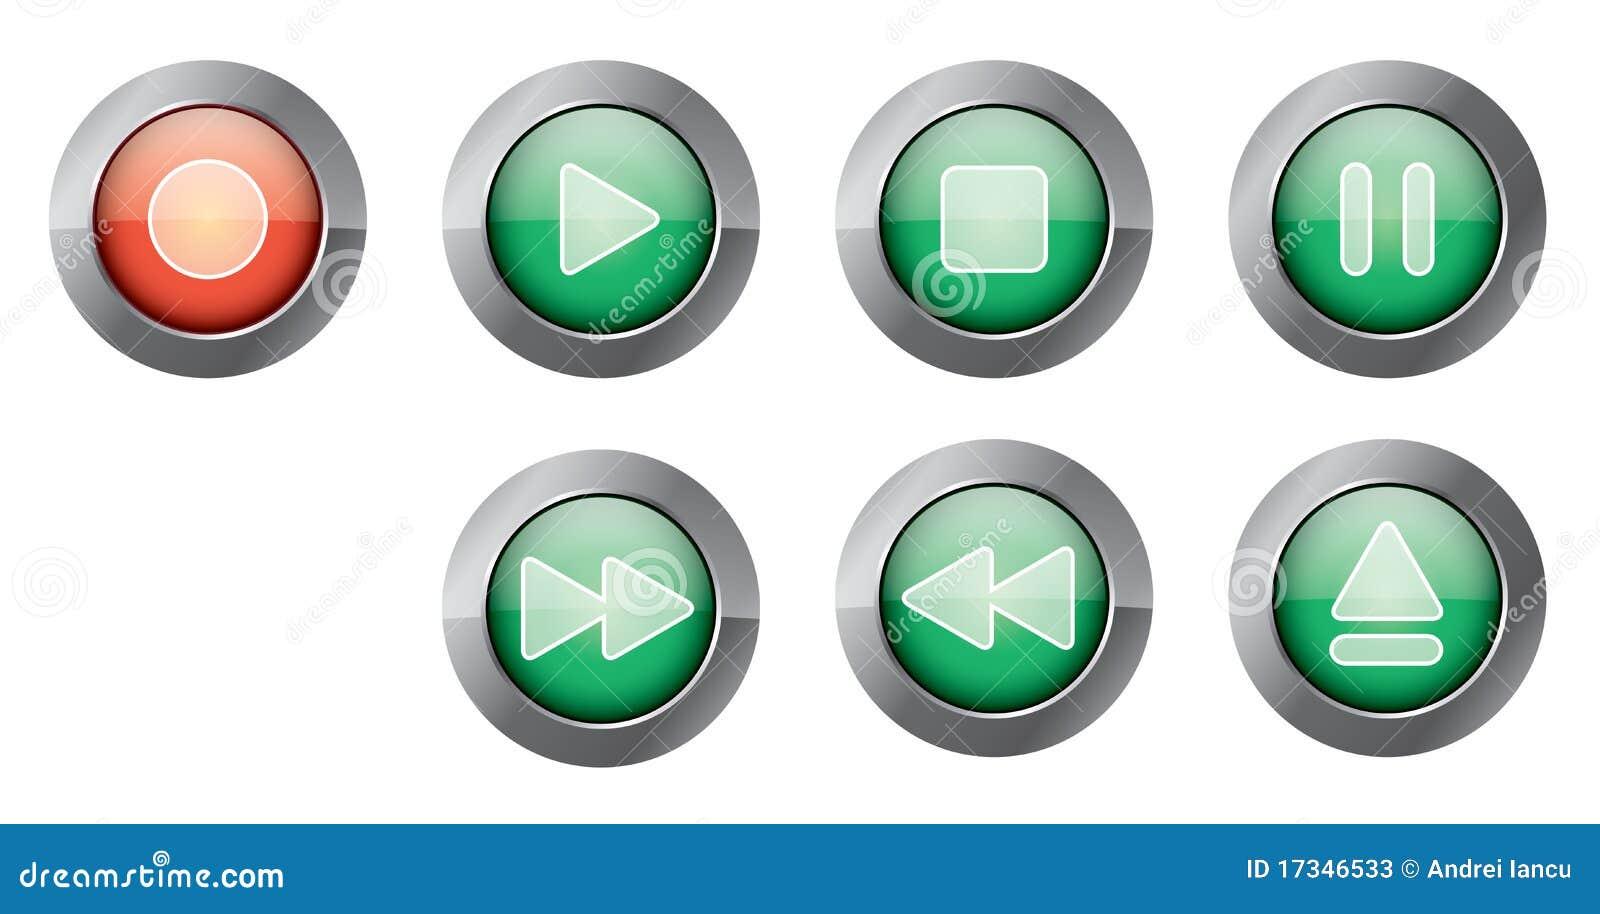 Green playback buttons stock photos image 17346533 - Green button ...